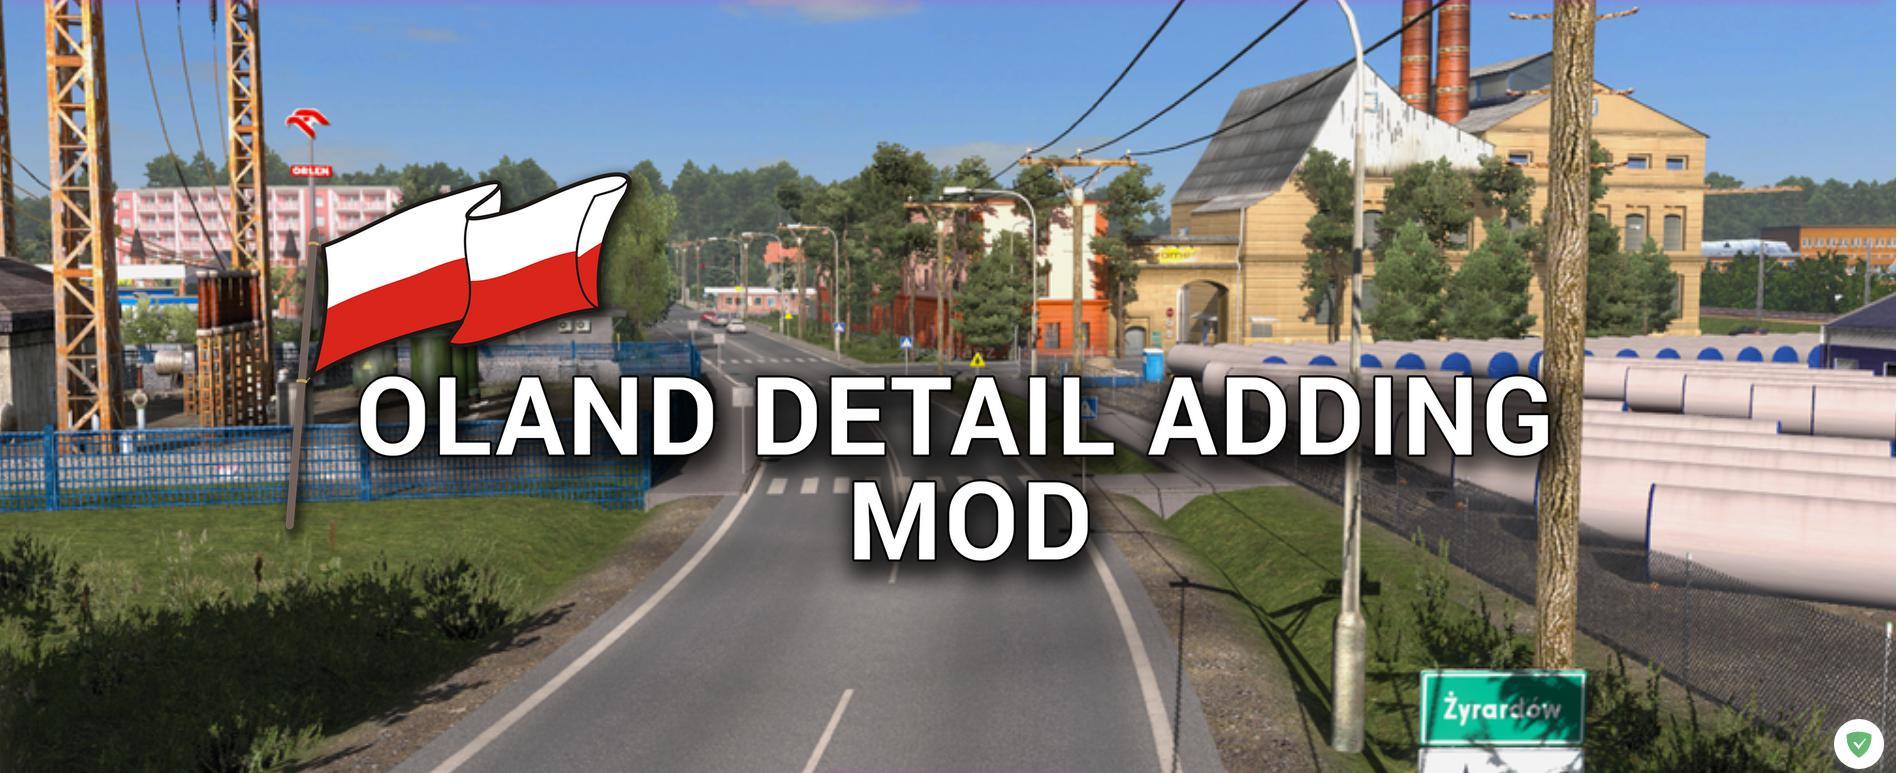 POLAND DETAIL ADDING MOD 1 35 MAP -Euro Truck Simulator 2 Mods